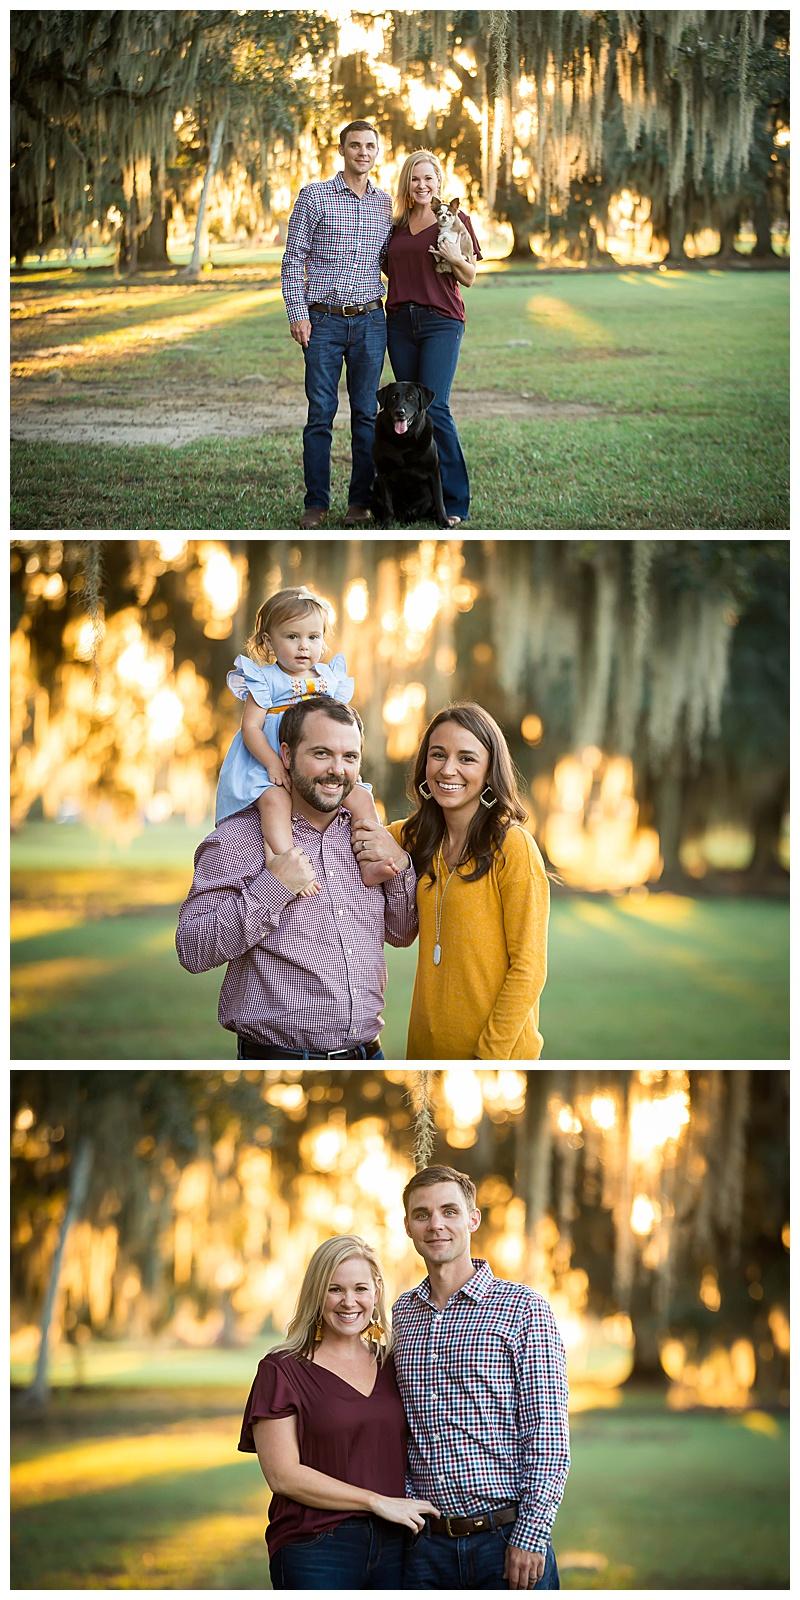 Big family photographer